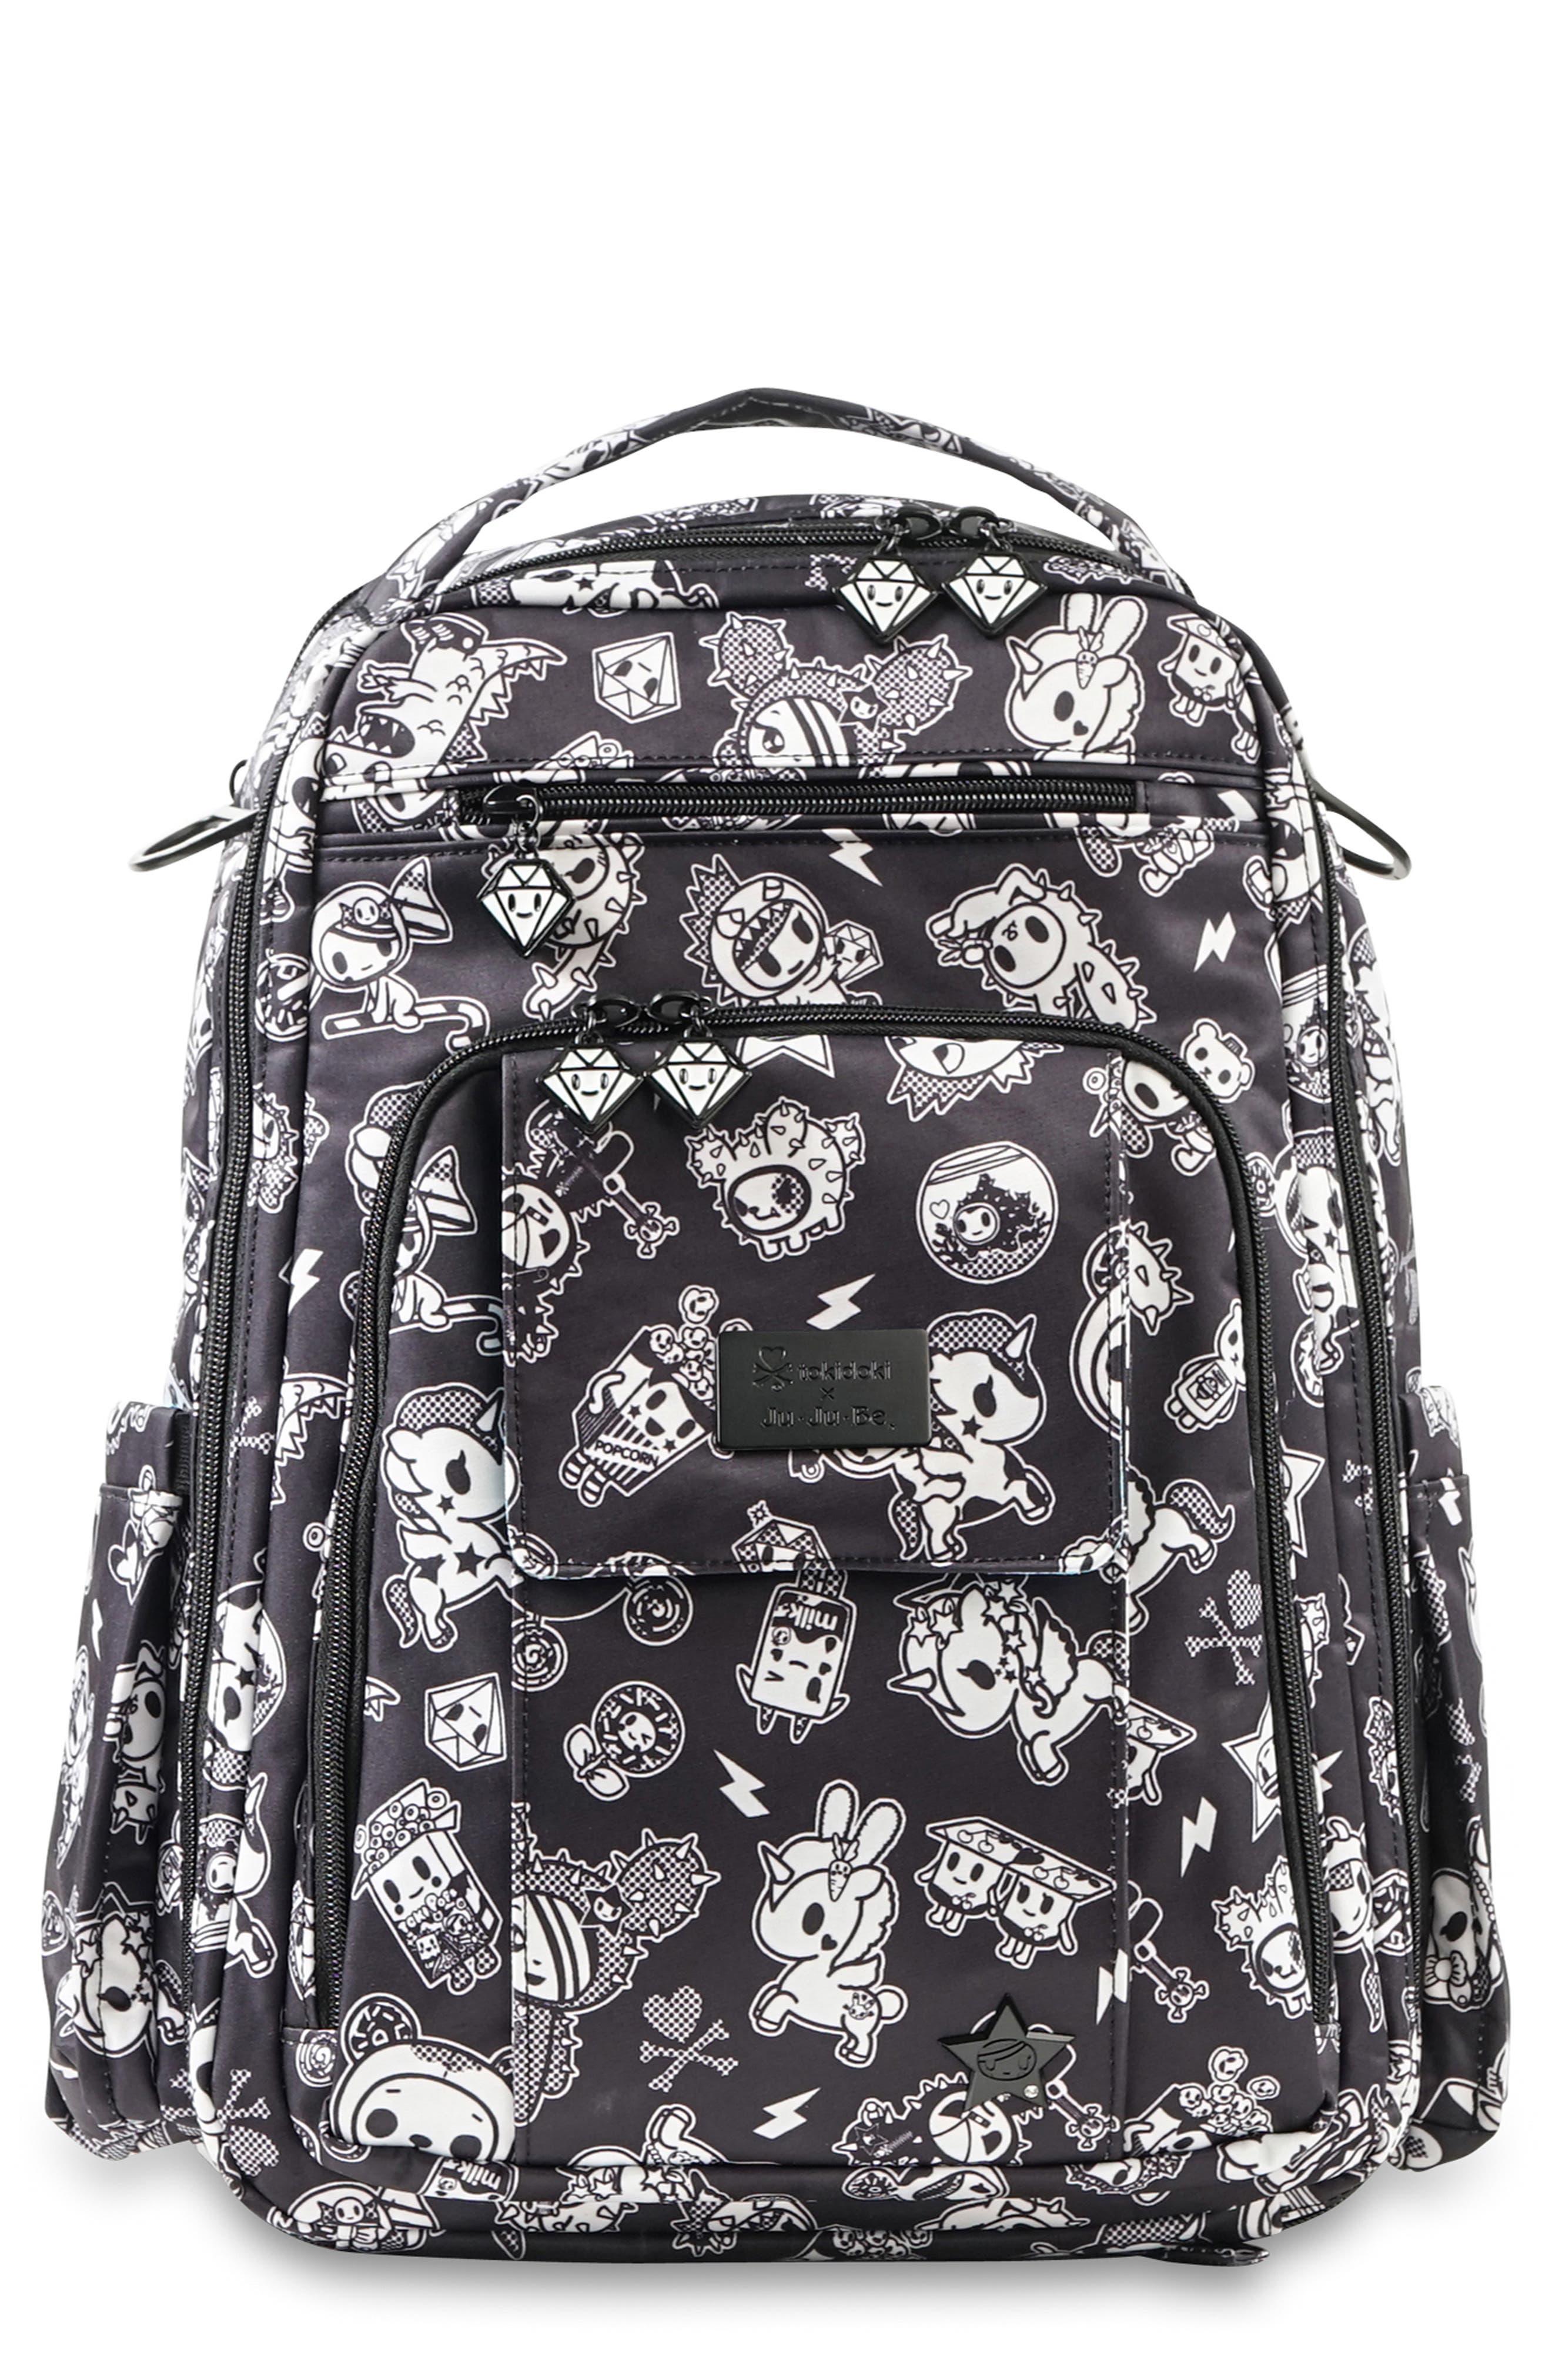 tokidoki x Ju-Ju-Be 'Be Right Back' Diaper Backpack,                             Main thumbnail 1, color,                             009